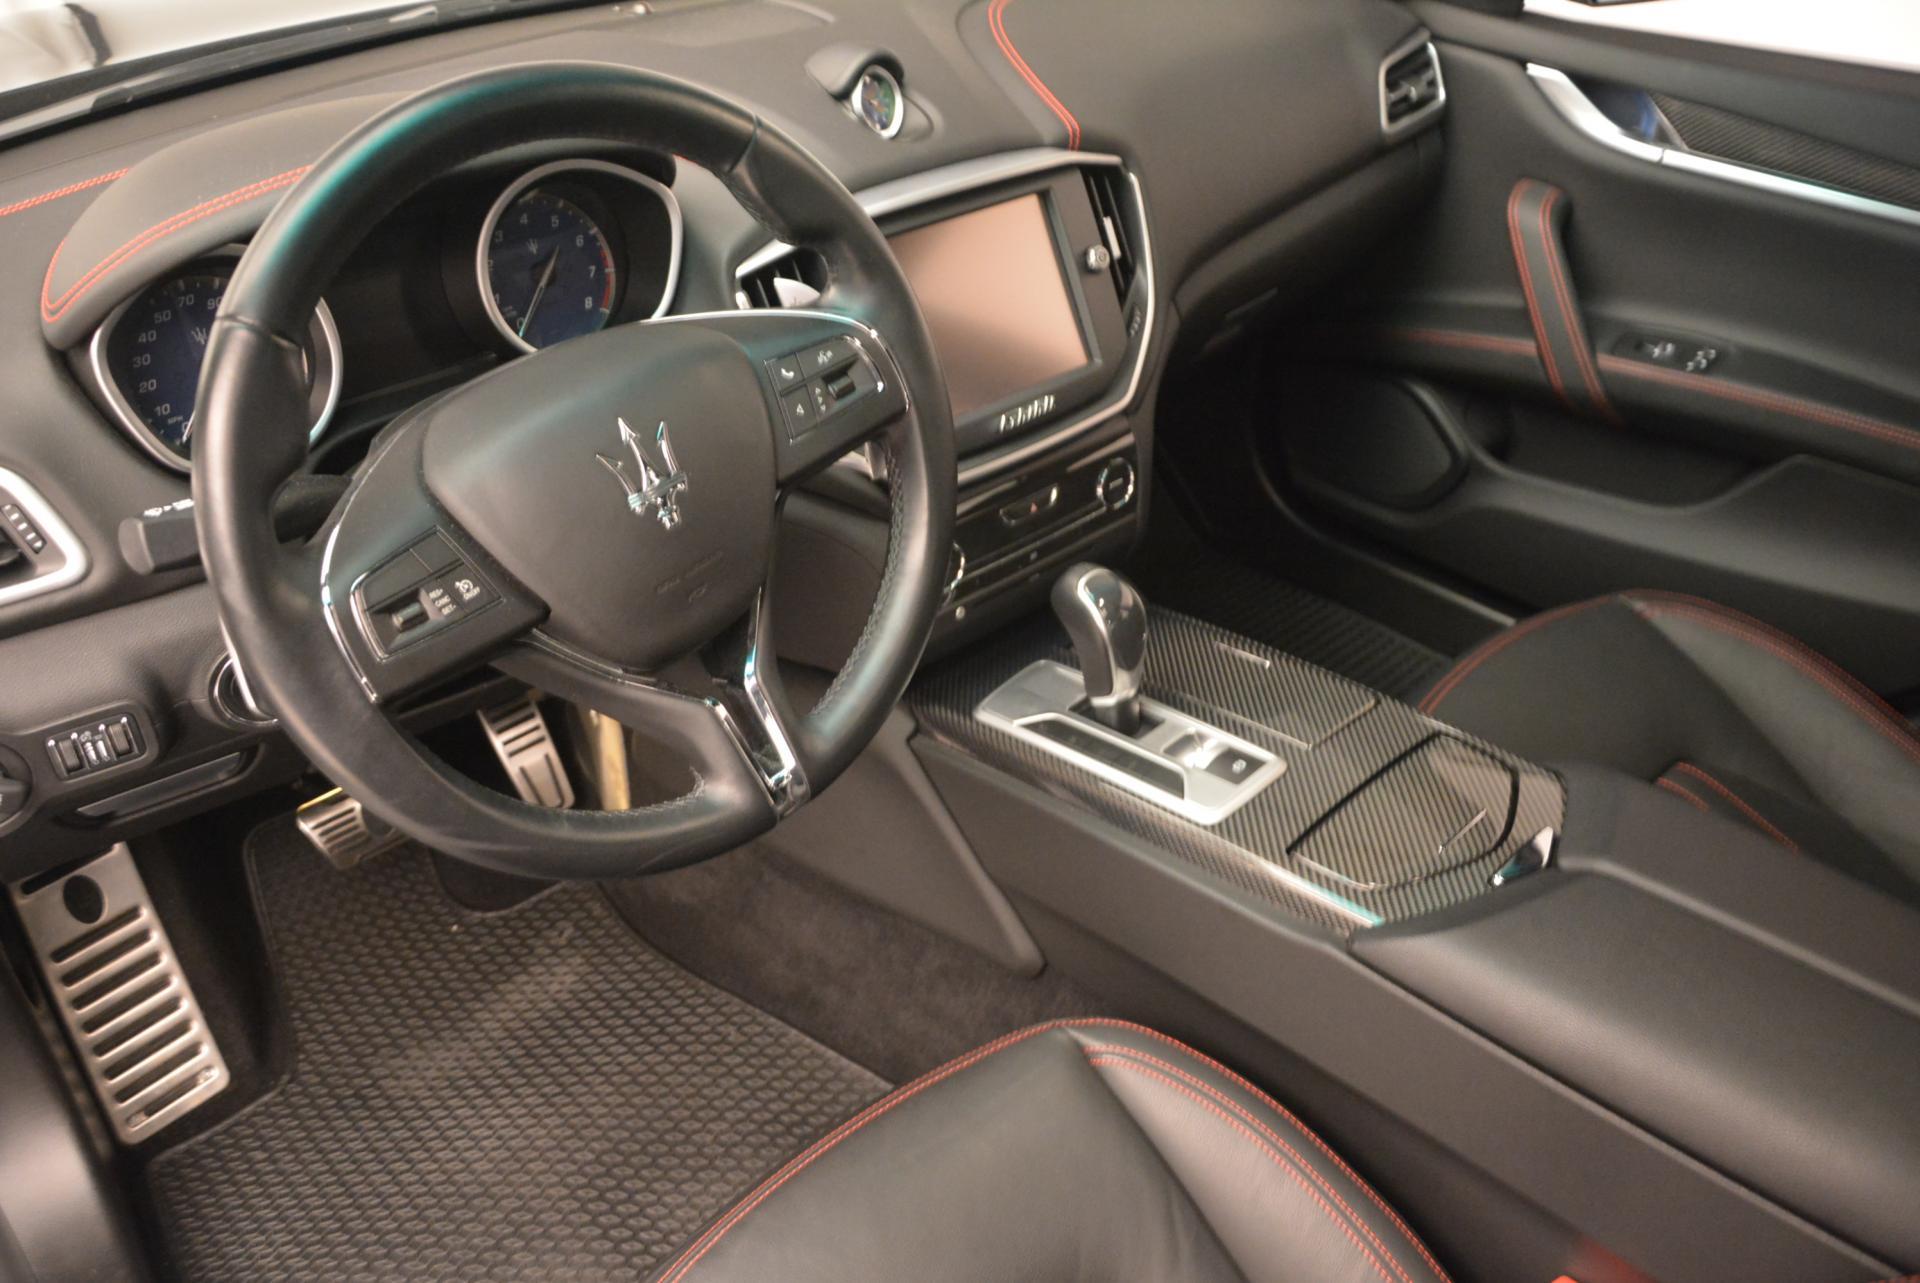 Used 2015 Maserati Ghibli S Q4 For Sale In Greenwich, CT 117_p12